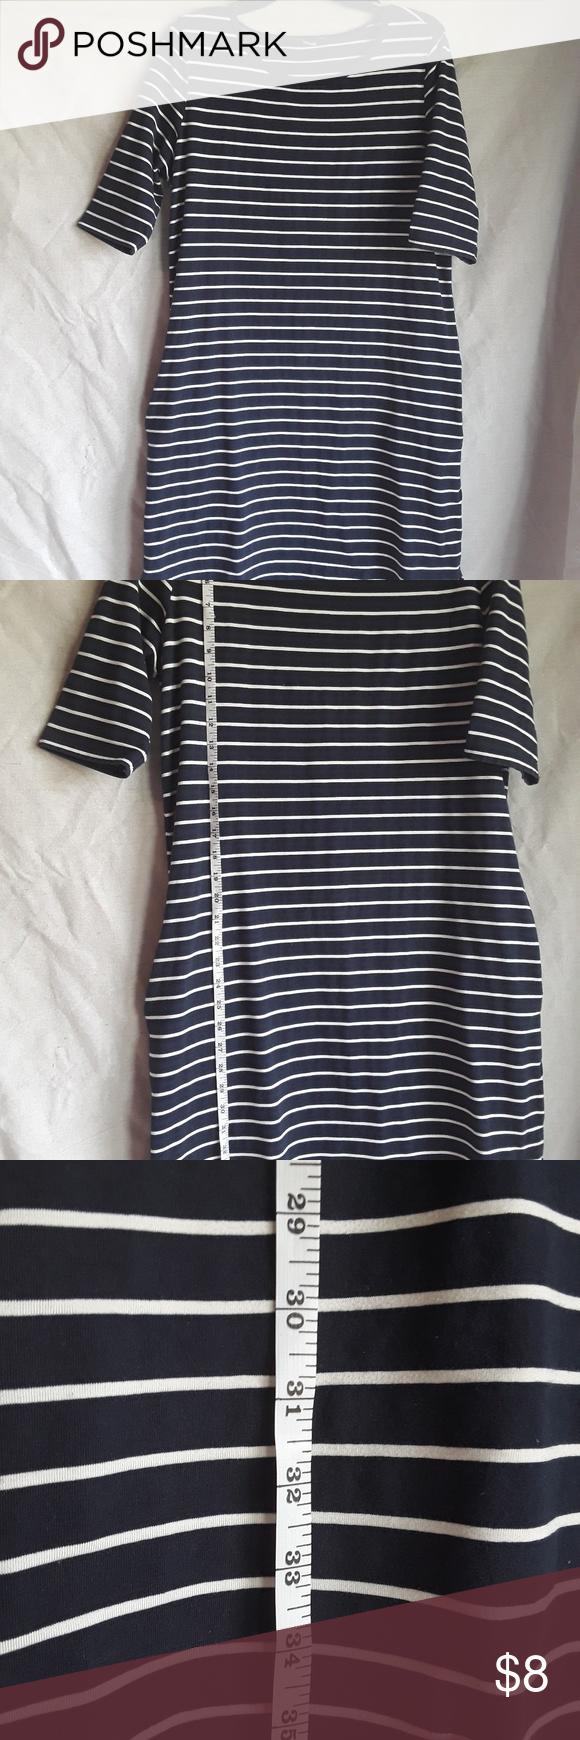 Stretchy Dress Blue With White Stripes Stretchy Dress Clothes Design Blue Dresses [ 1740 x 580 Pixel ]